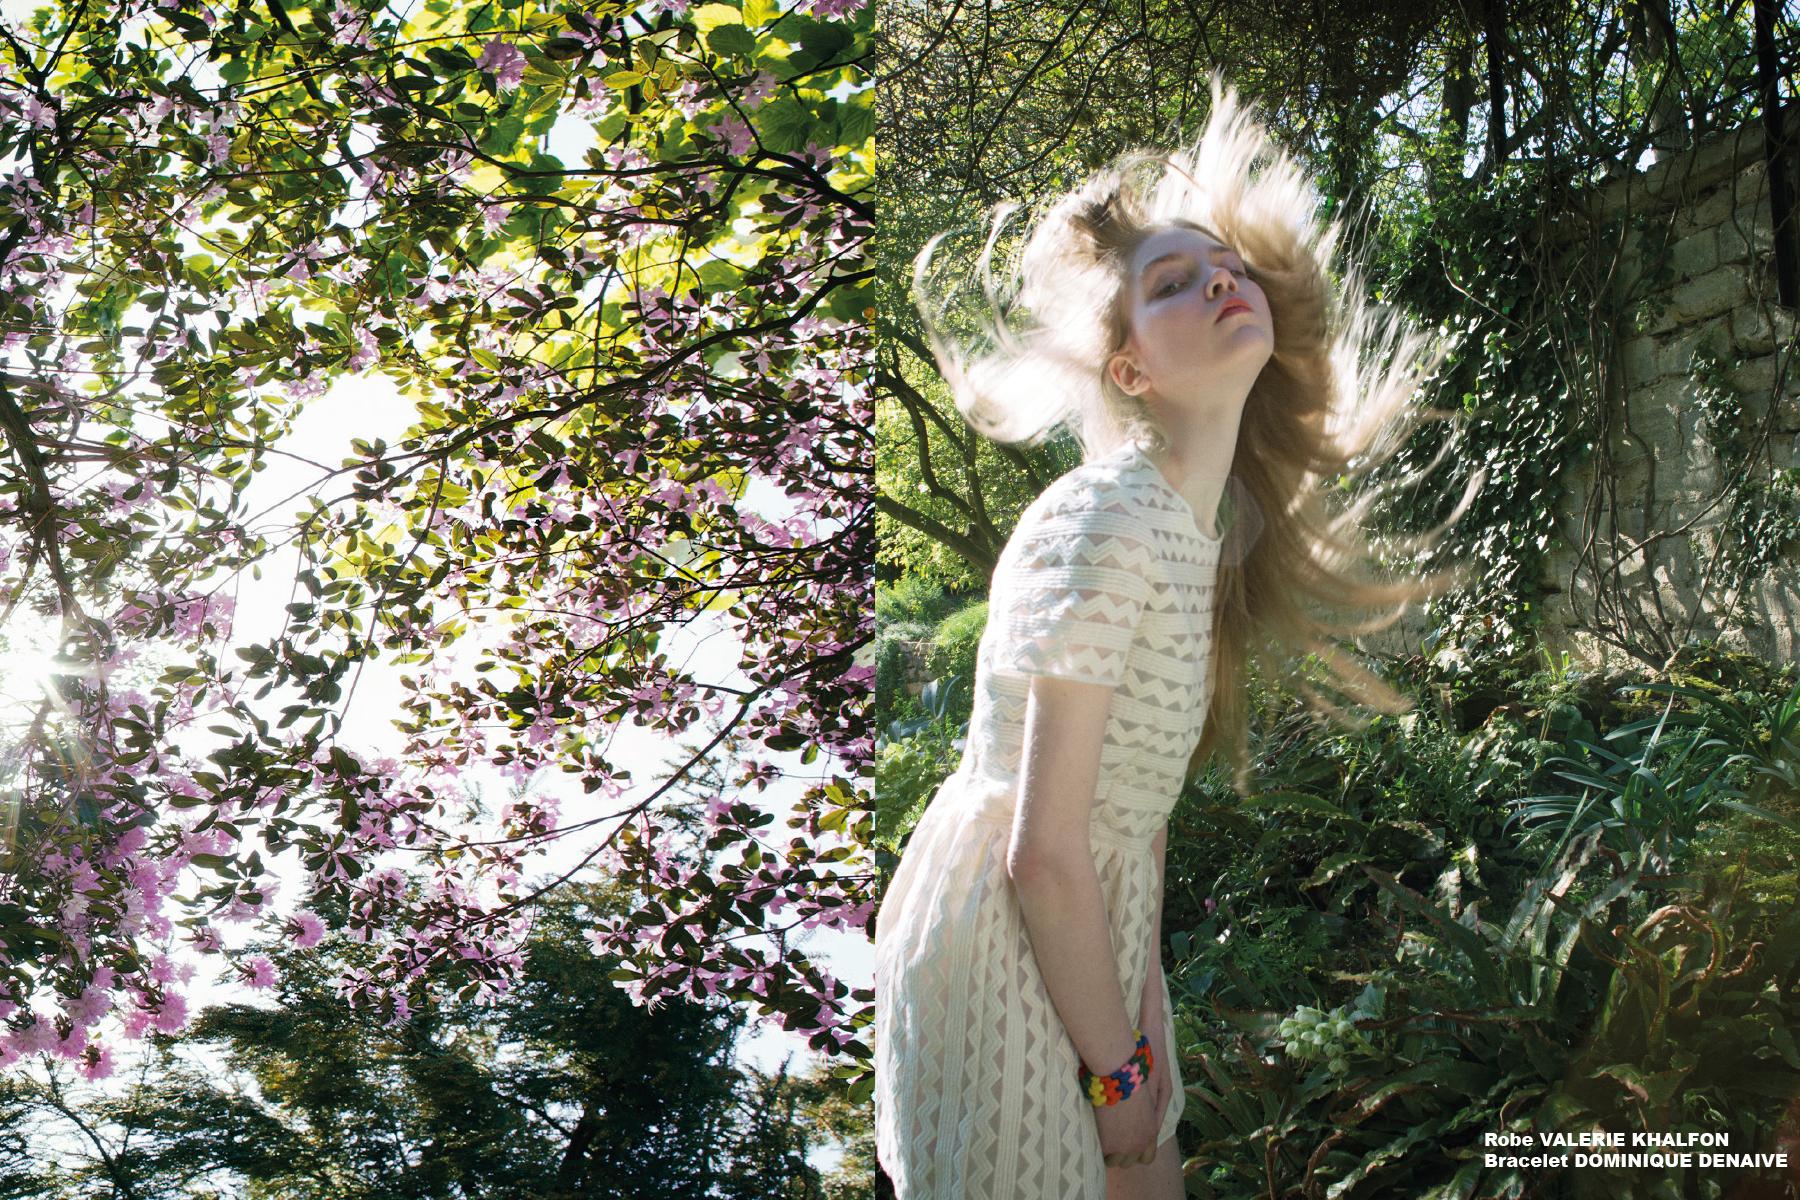 PascaleLourmand_JusteMagazine_GardenParty-Daria6